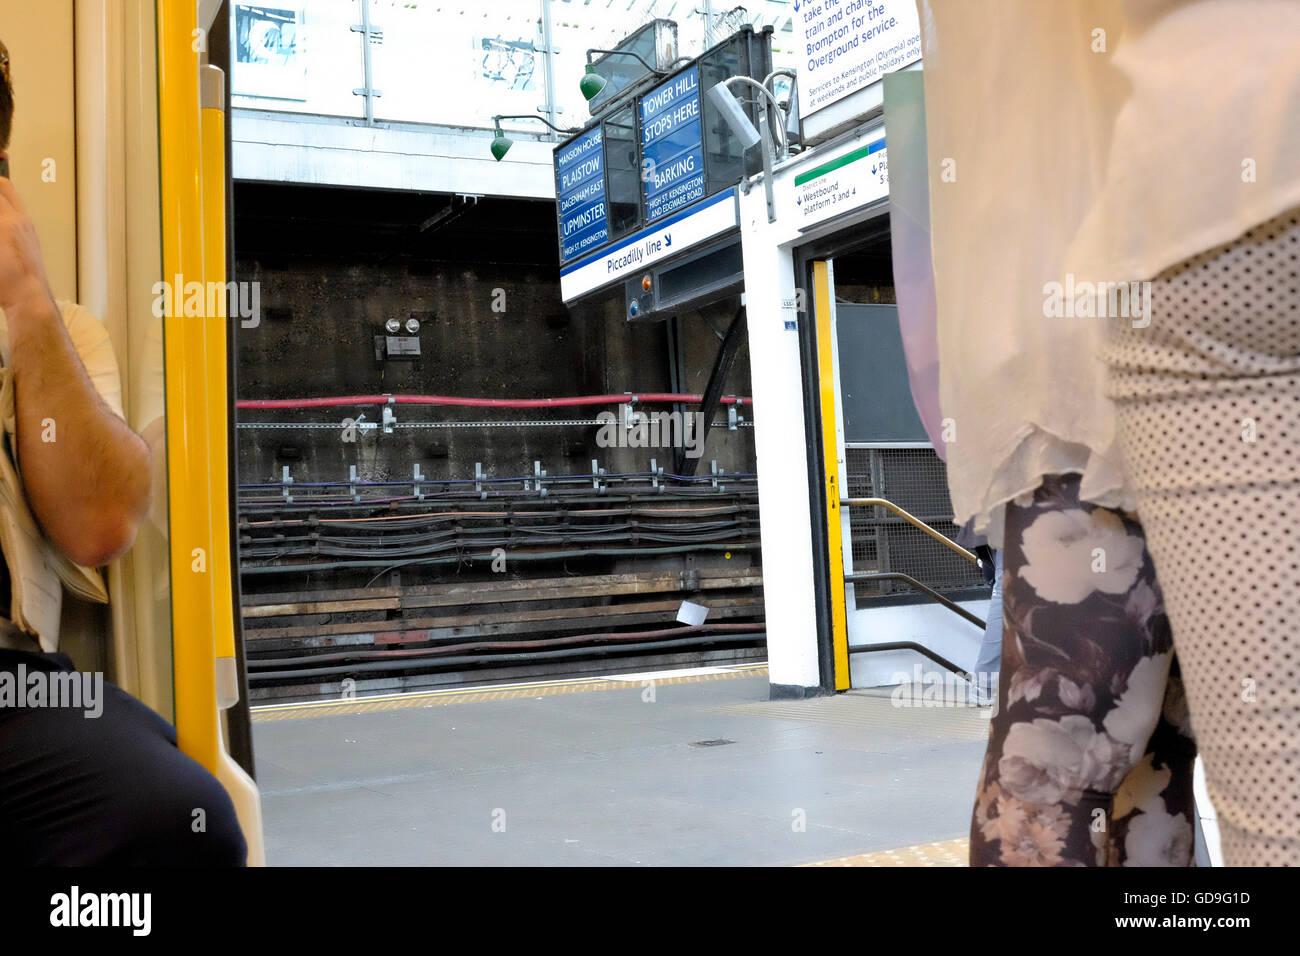 Underground station cabling through open train door. - Stock Image